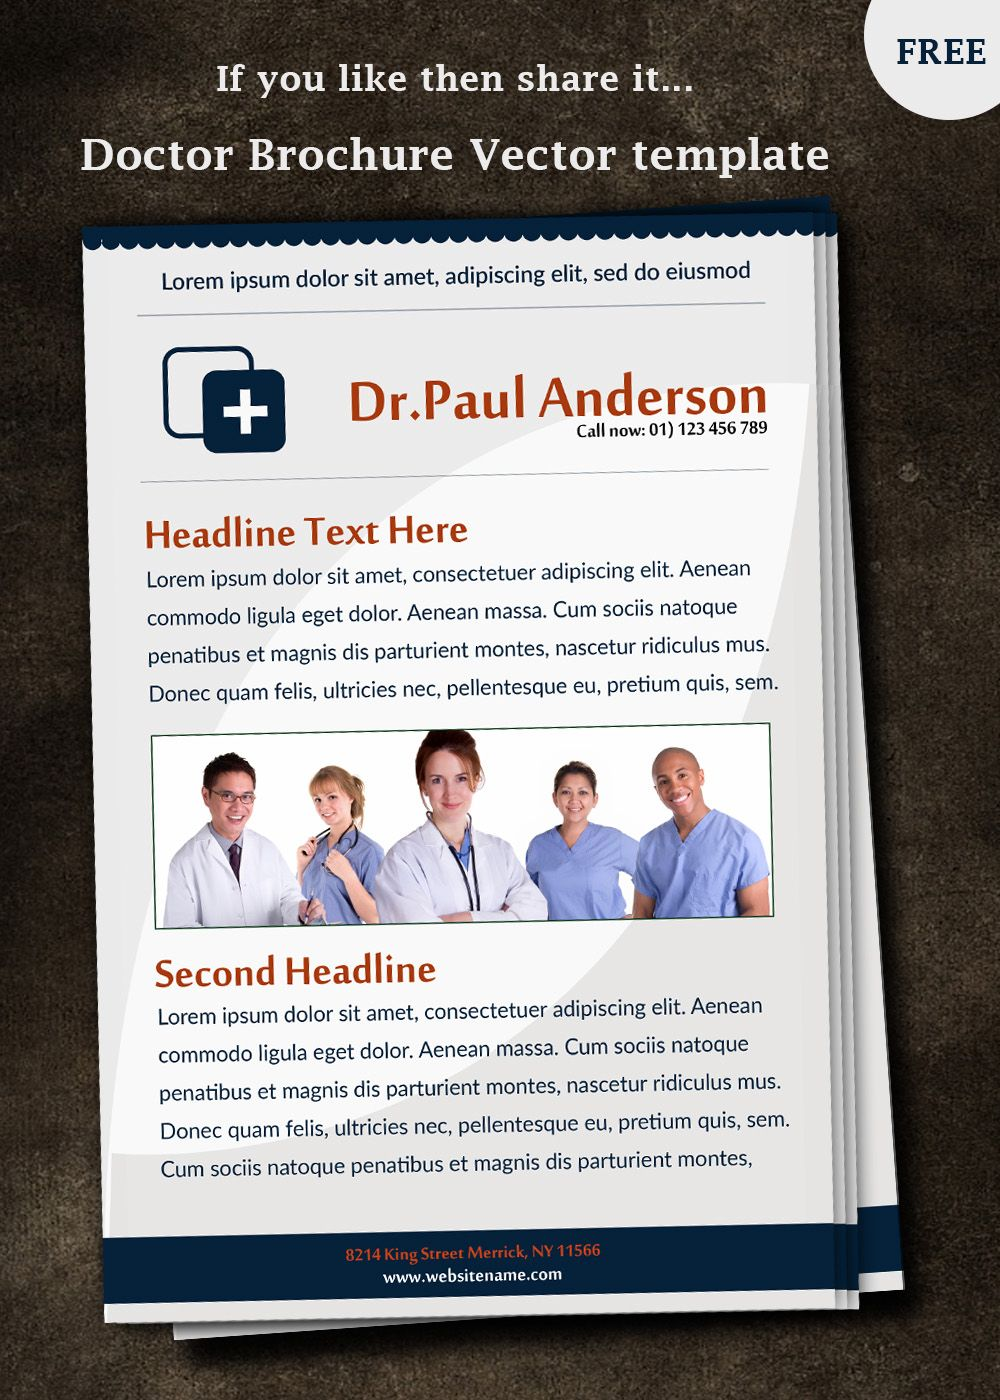 free doctor brochure template | brochure Design | Pinterest | Psd ...